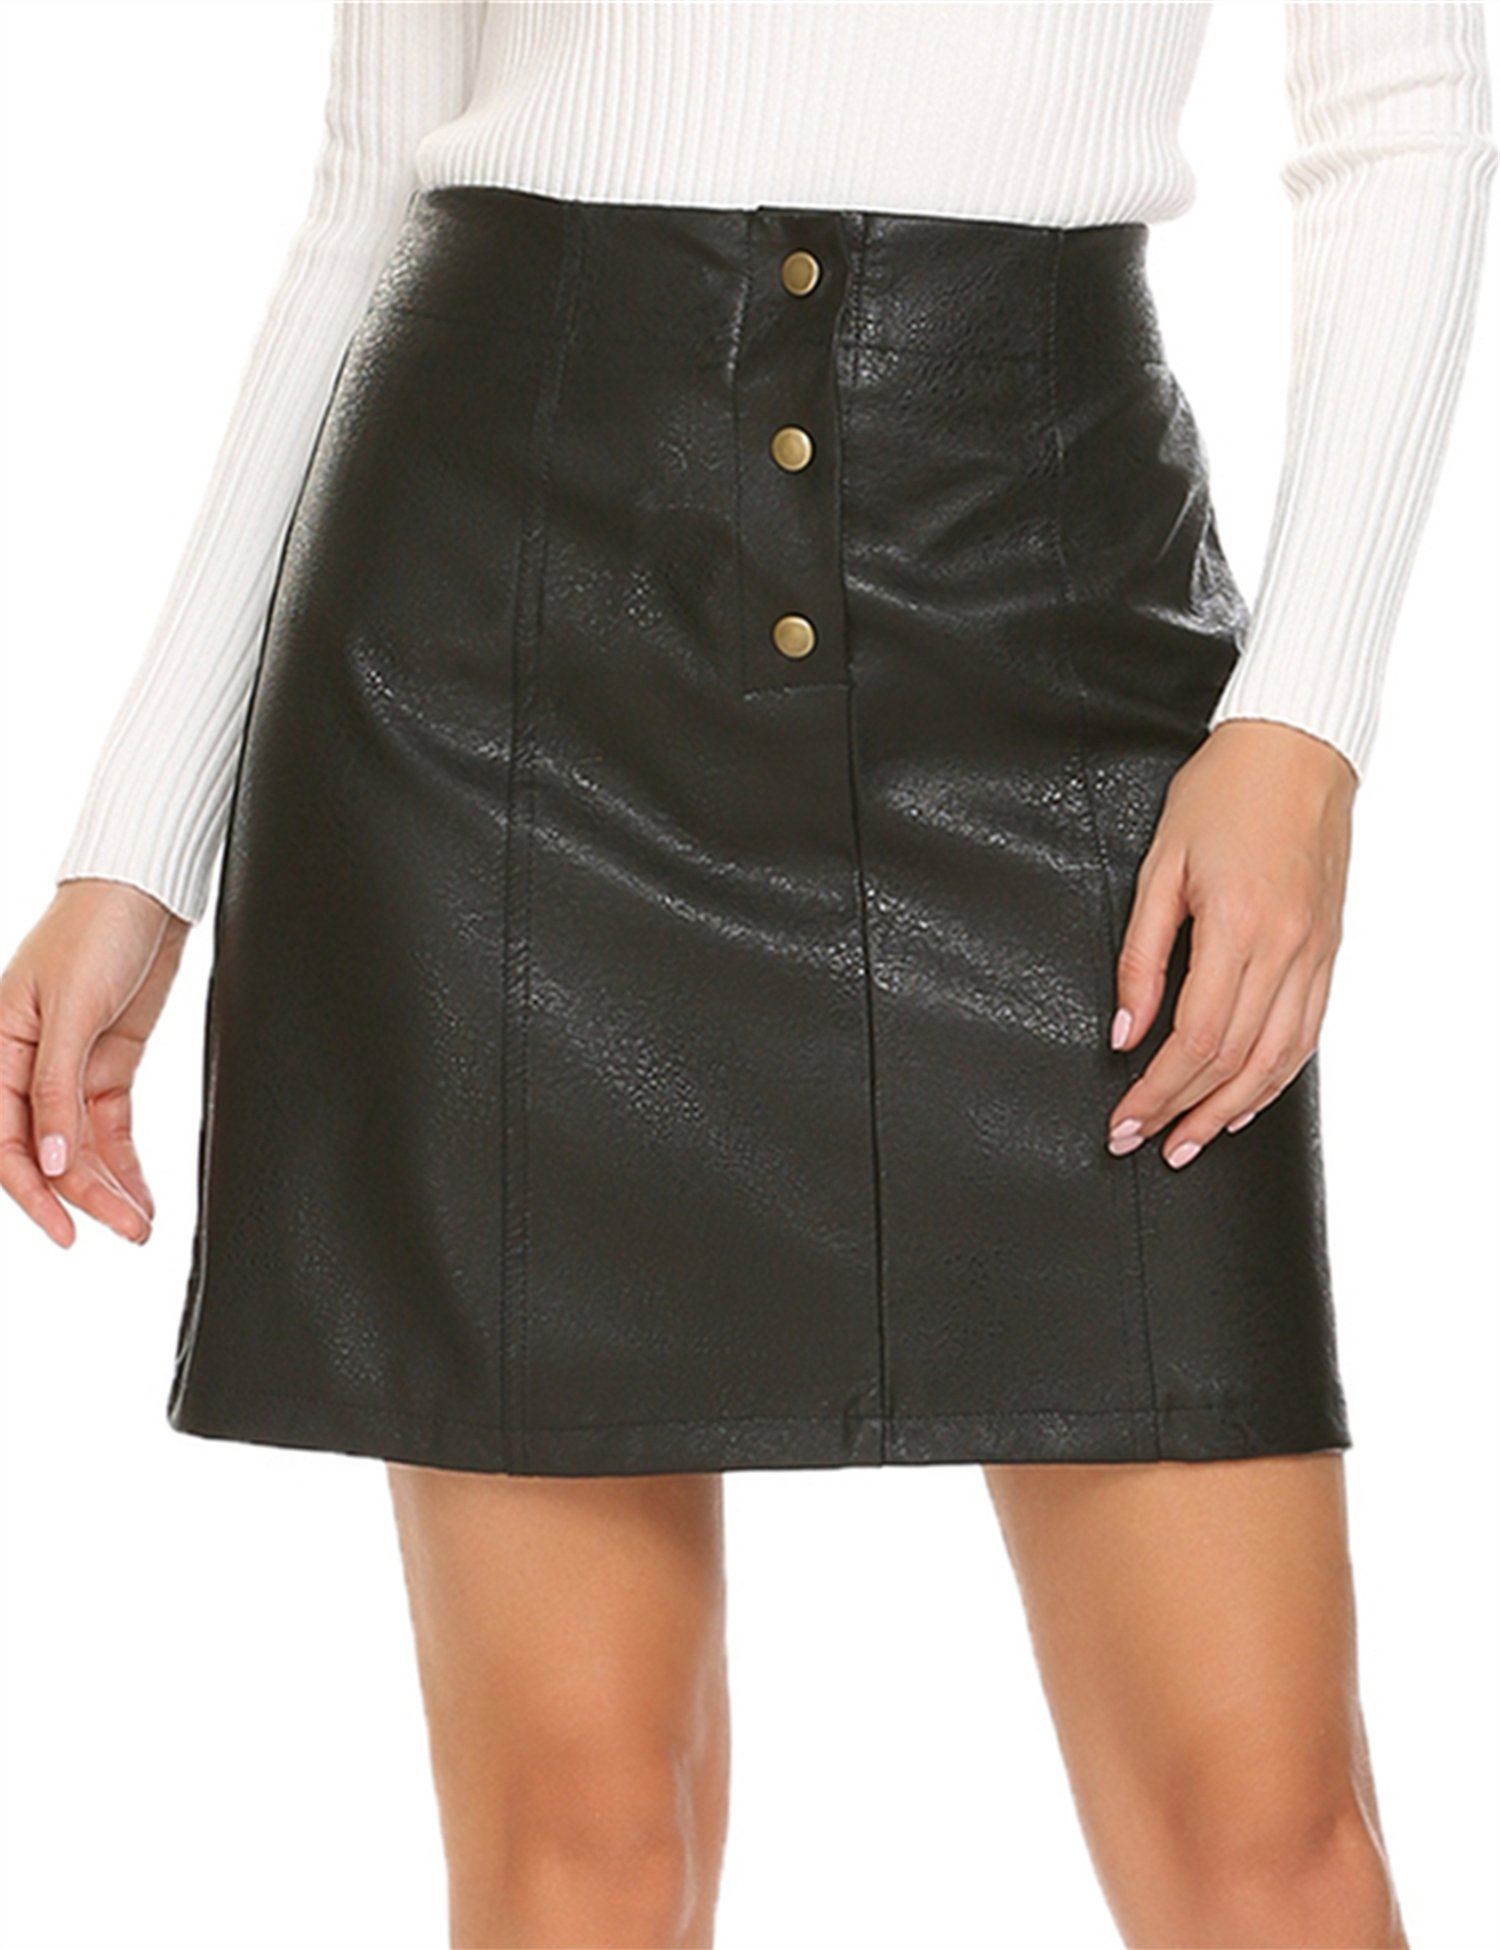 Mofavor Women's Button Front Classic High Waist A Line Faux Leather Mini Skirt